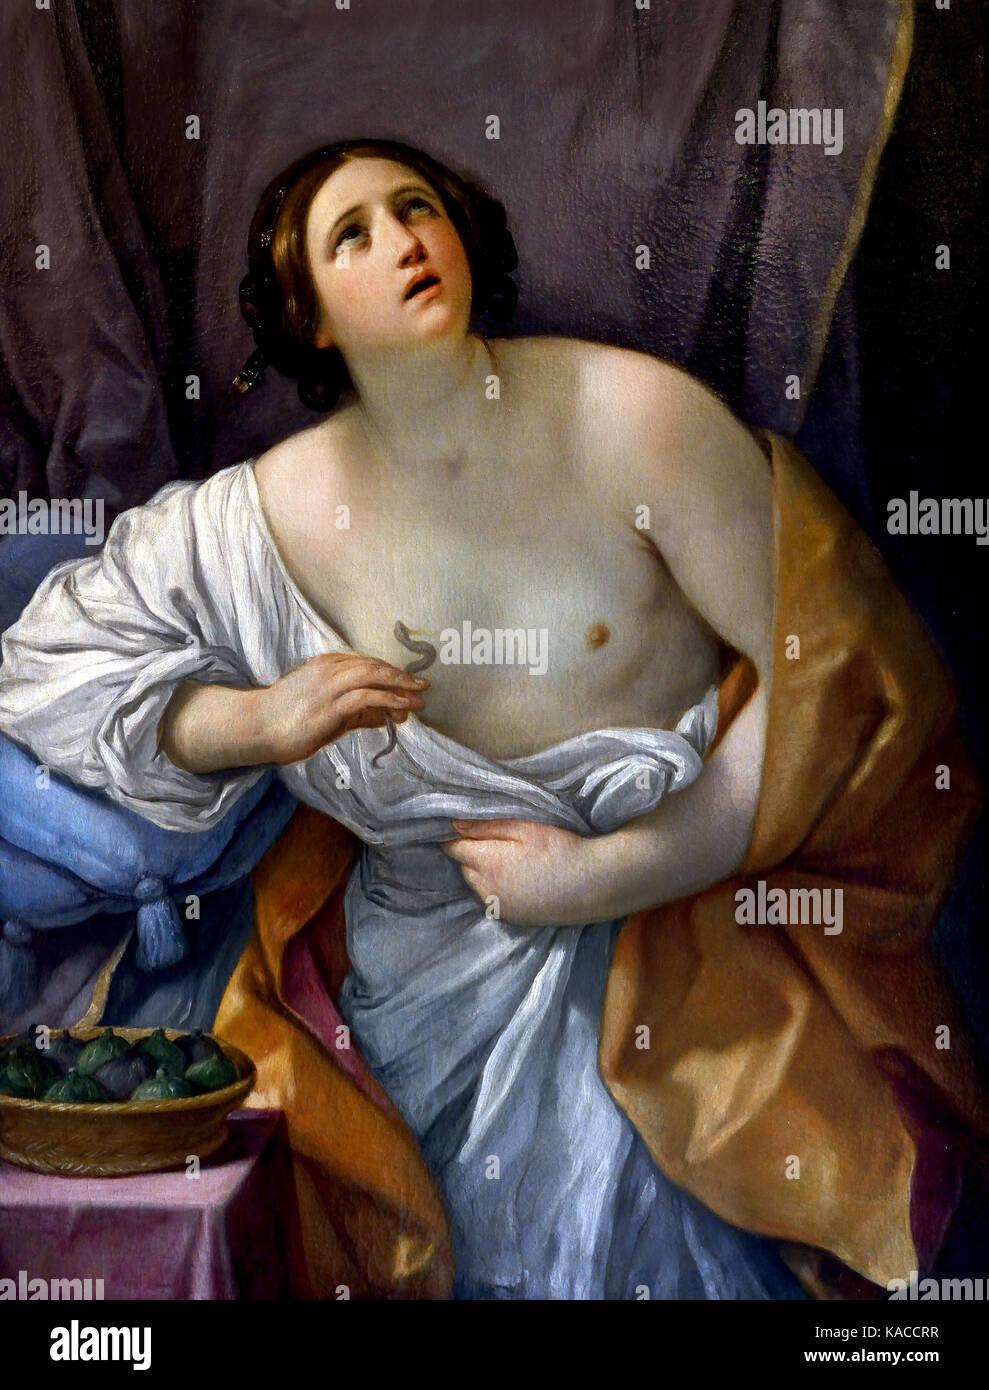 Cleopatra, Guido Reni 1575 - 1642 war ein italienischer Maler des Barock. Philopator Kleopatra VII 69 - 30 v. Chr., Stockbild